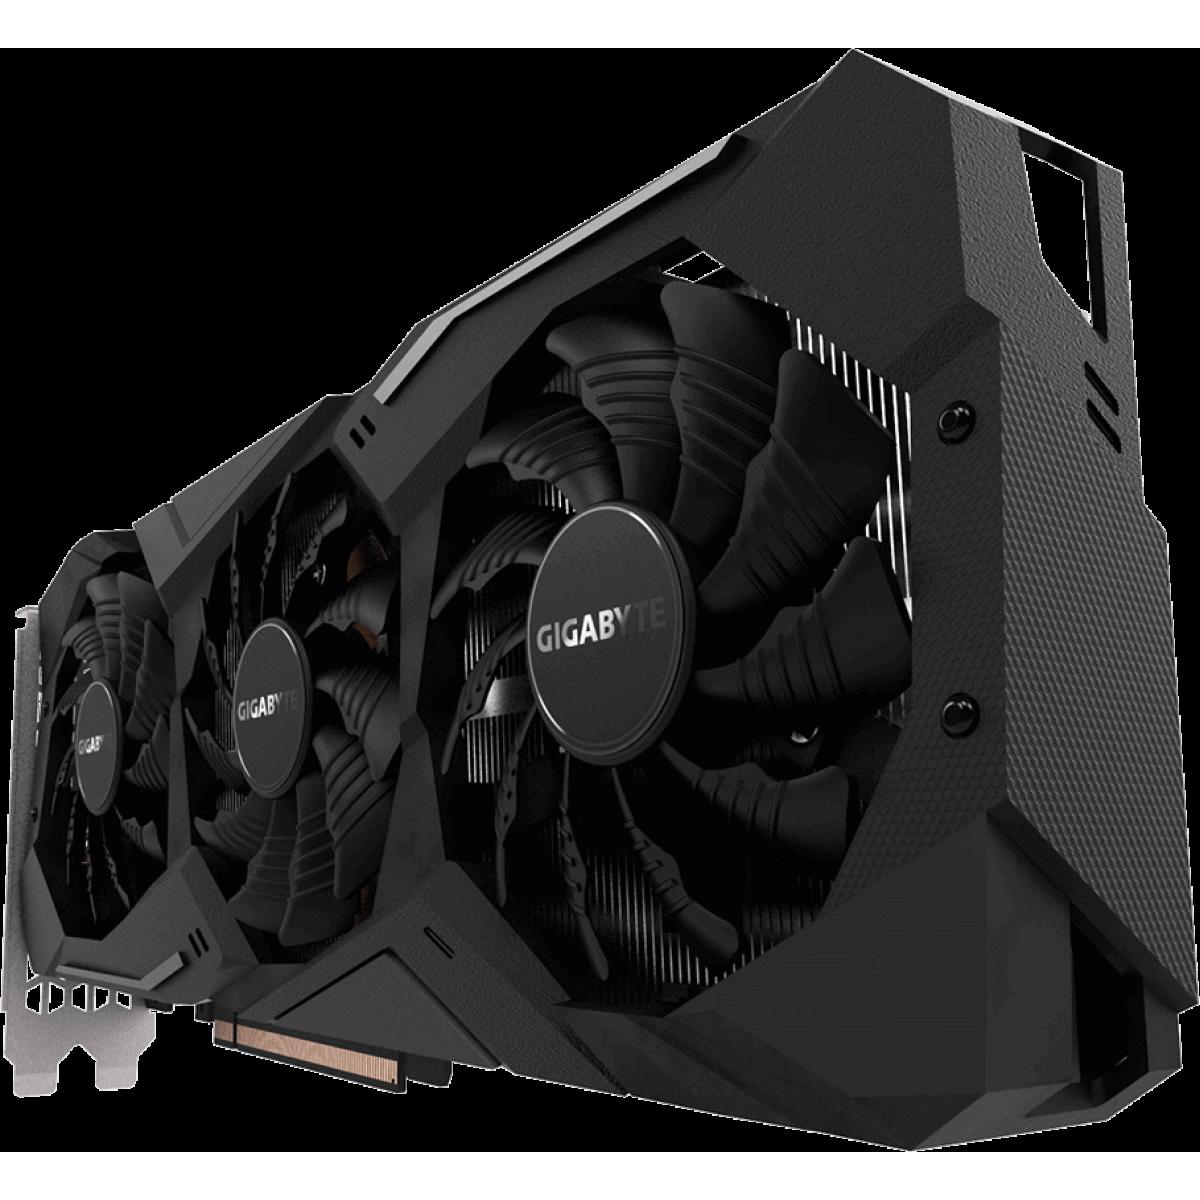 Placa de Vídeo Gigabyte Geforce RTX 2070 Windforce 8GB GV-N2070WF3-8GC GDDR6 PCI-EXP